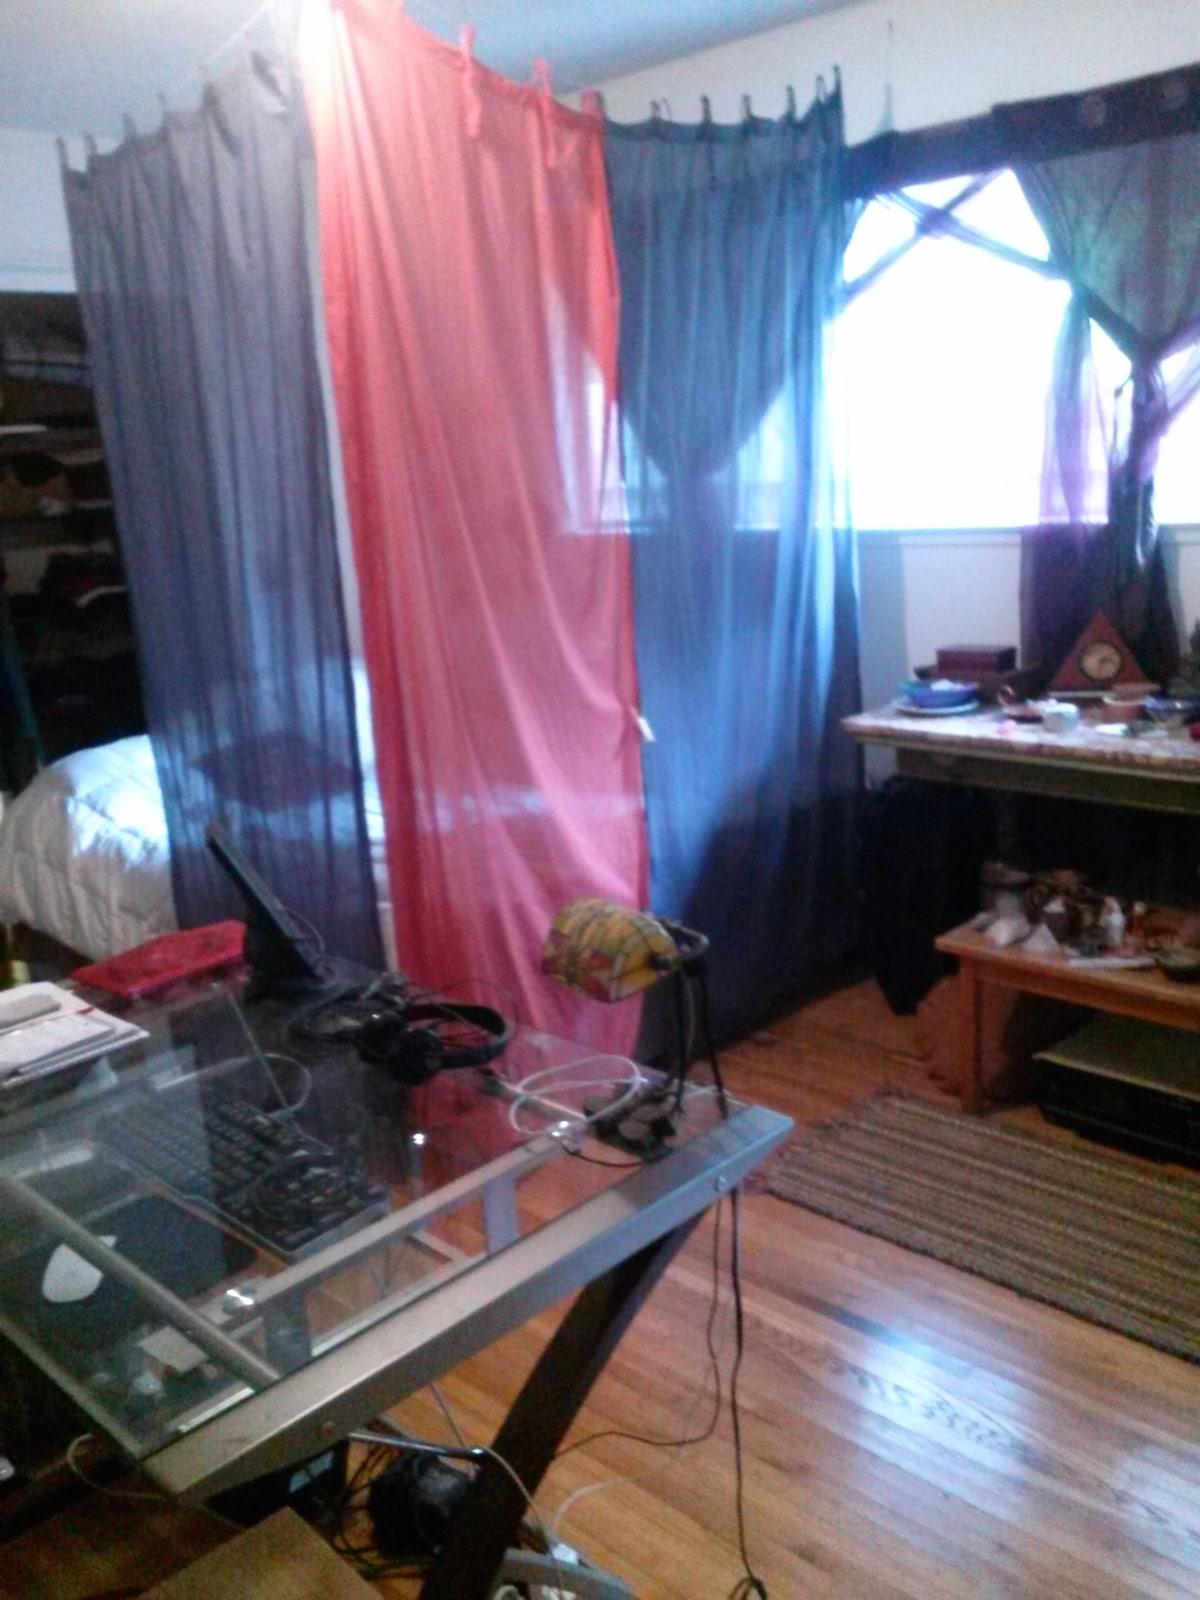 The bedroom... bed, desk, wood floors